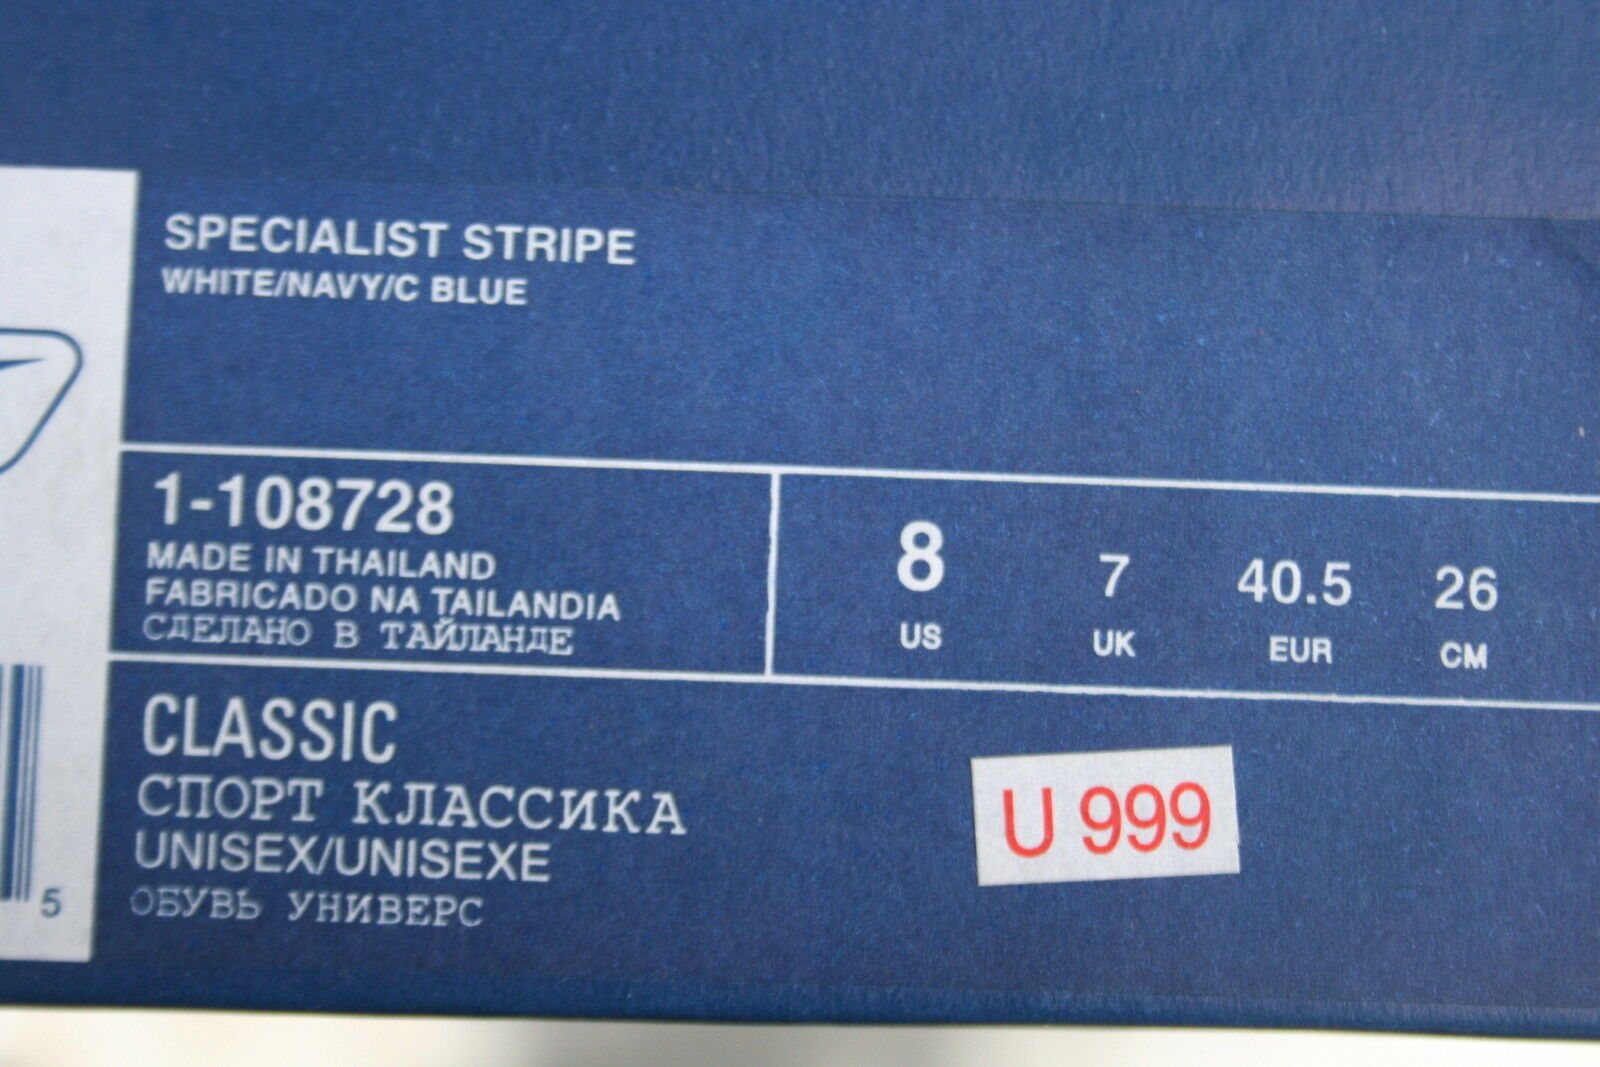 Reebok BIANCO BLU TG. 40,5 RB 402 WFC Scarpe Scarpe Scarpe Sportive Specialist Stripe 1-108728 - NUOVO | Consegna Immediata  cf0075